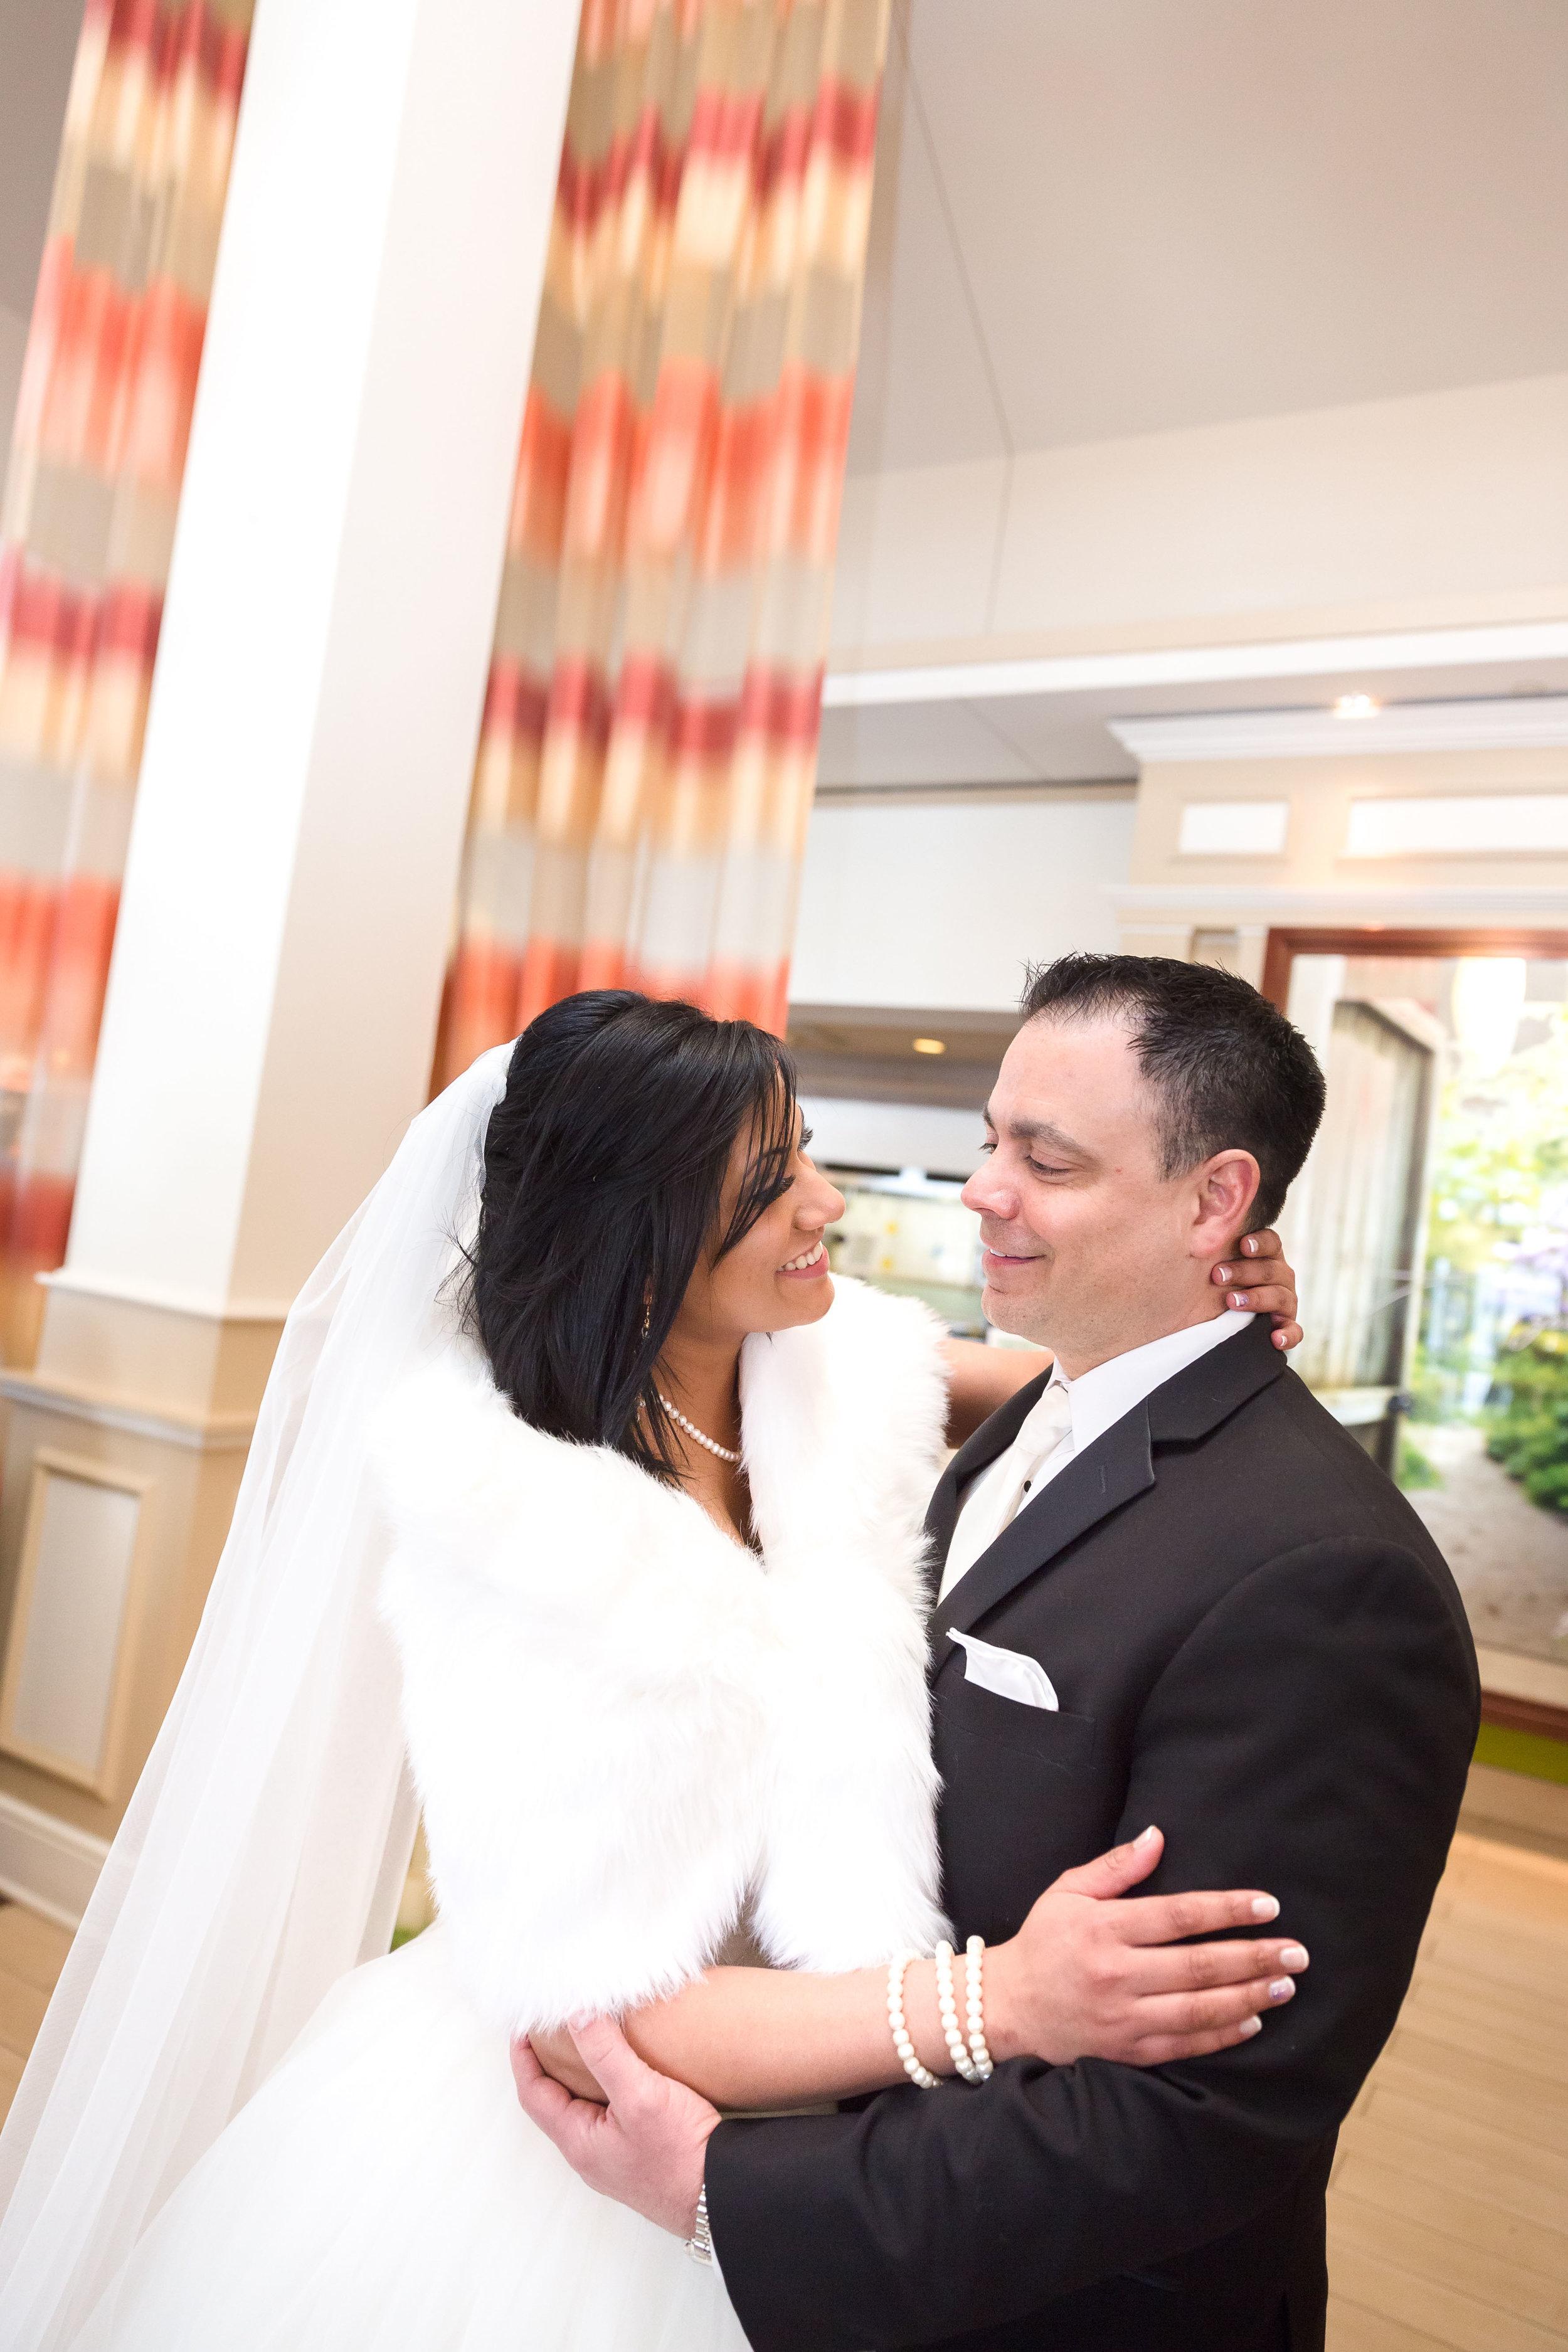 JVaughn_Photography_Weddings_Huntley_Photographer_Professional_Wedding0337.jpg